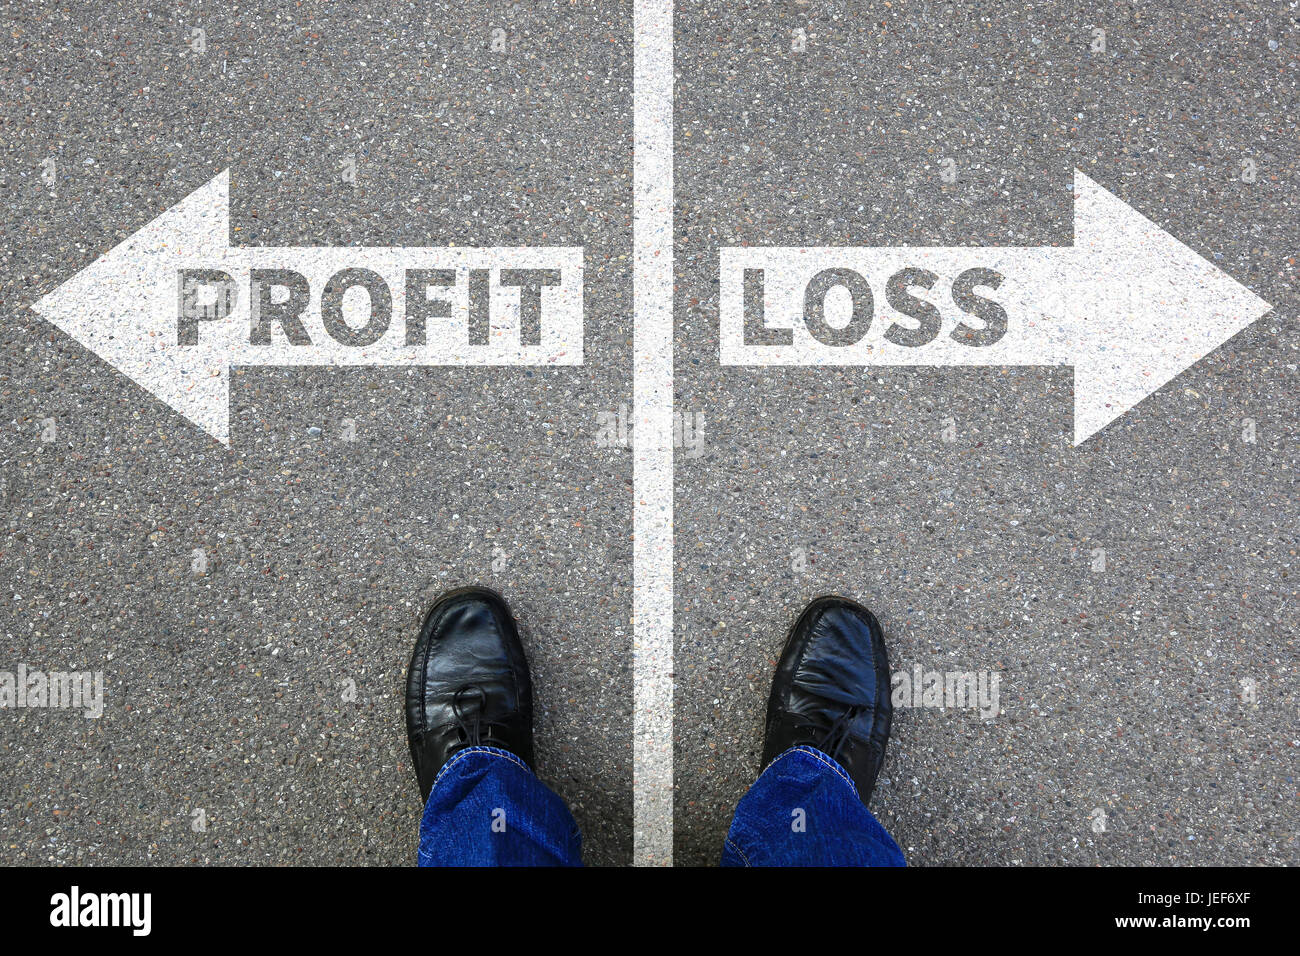 Loss and profit finances financial success company businessman business concept successful - Stock Image